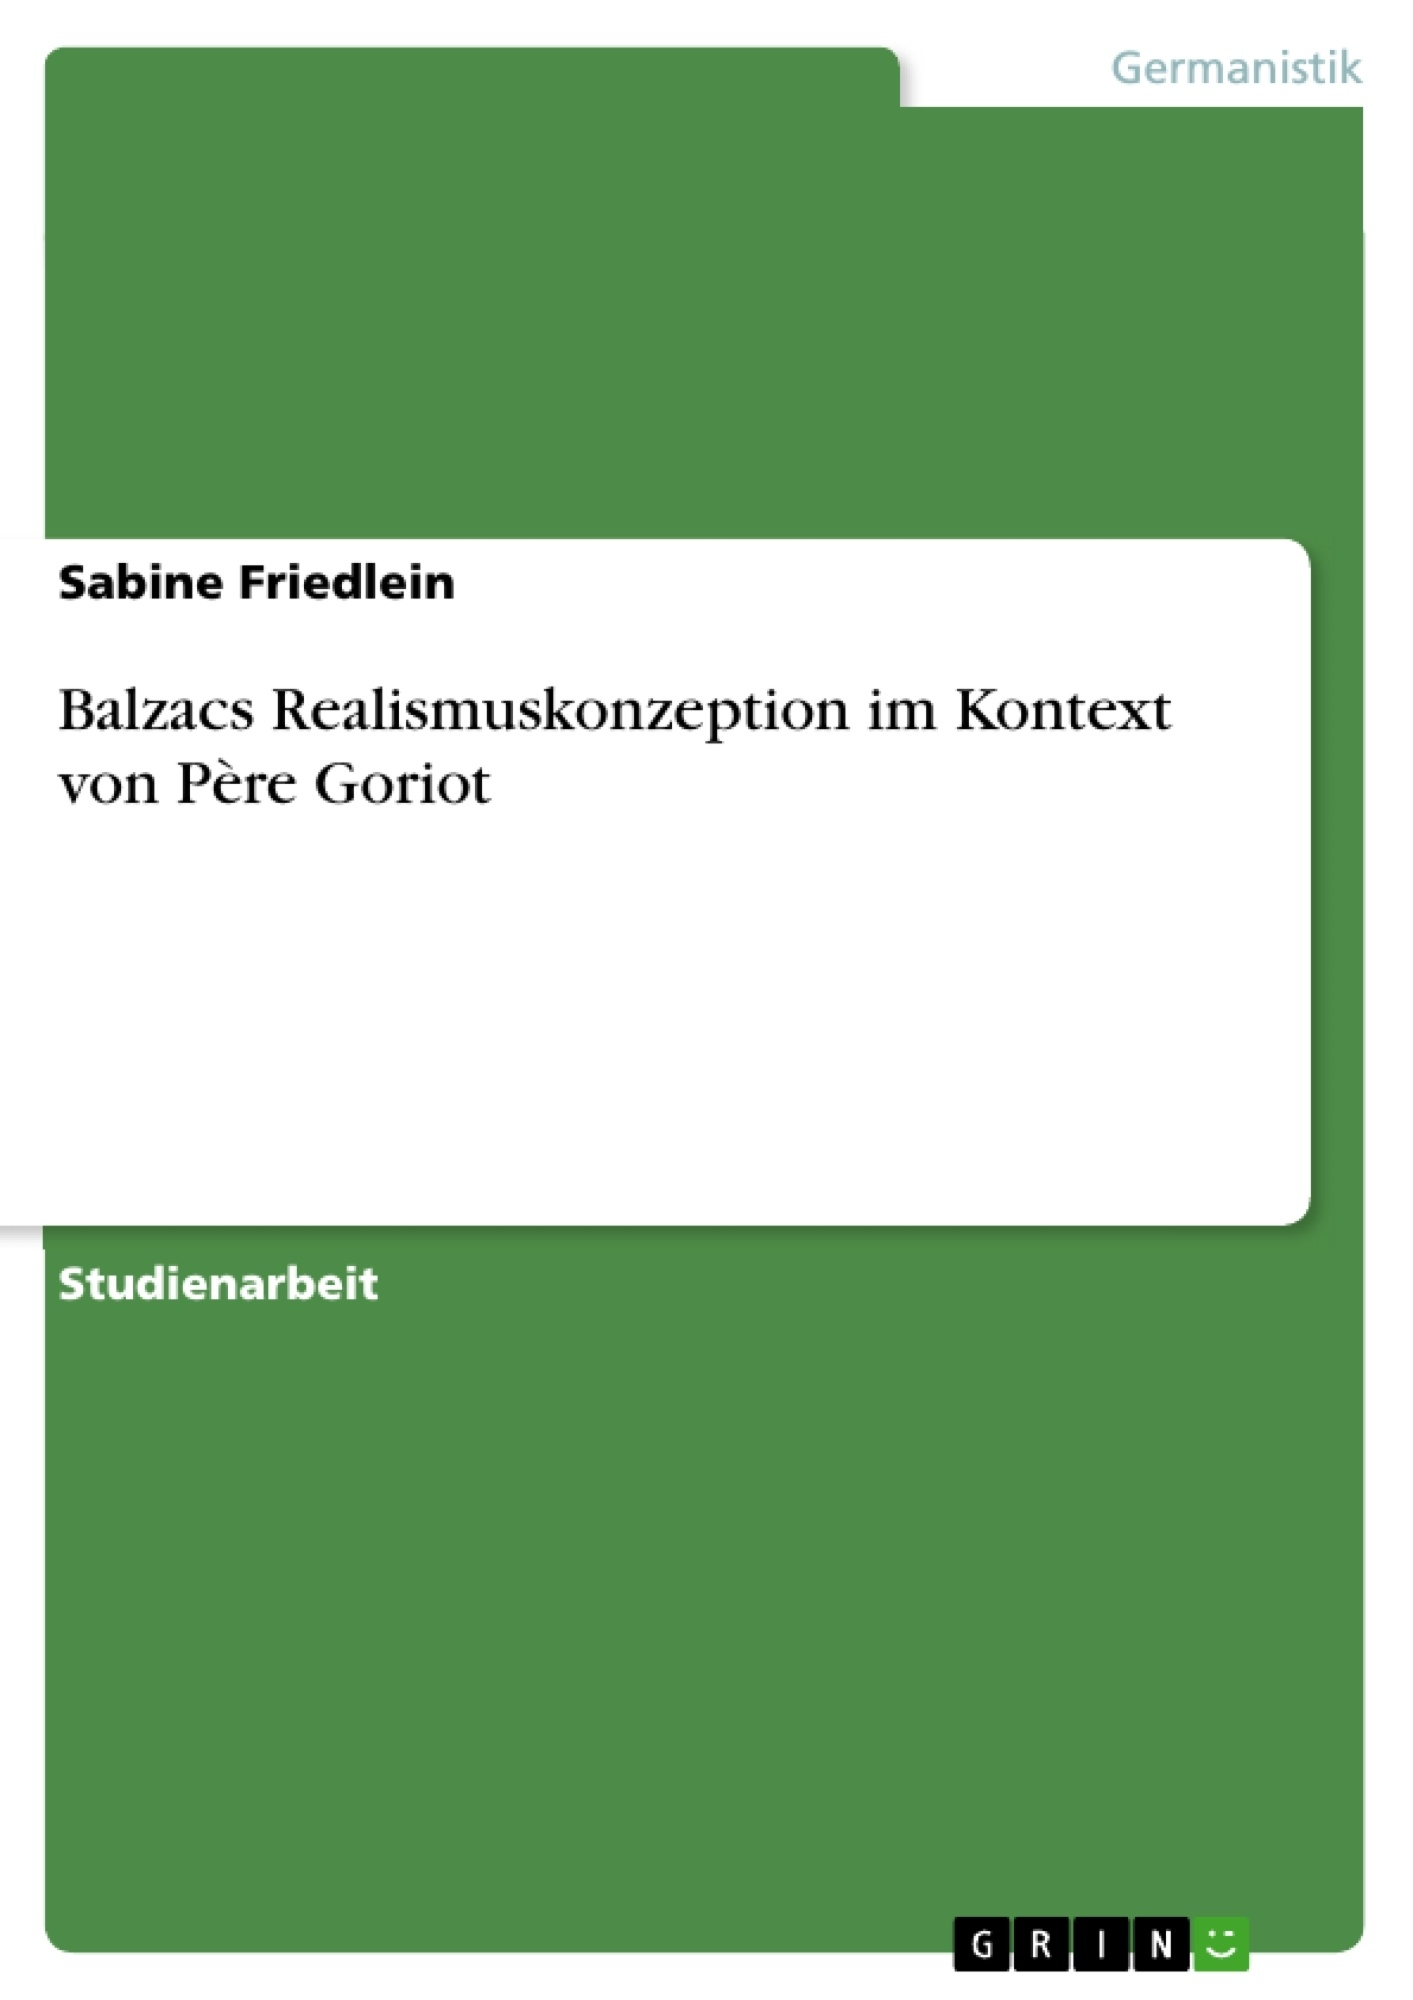 Titel: Balzacs Realismuskonzeption im Kontext von Père Goriot